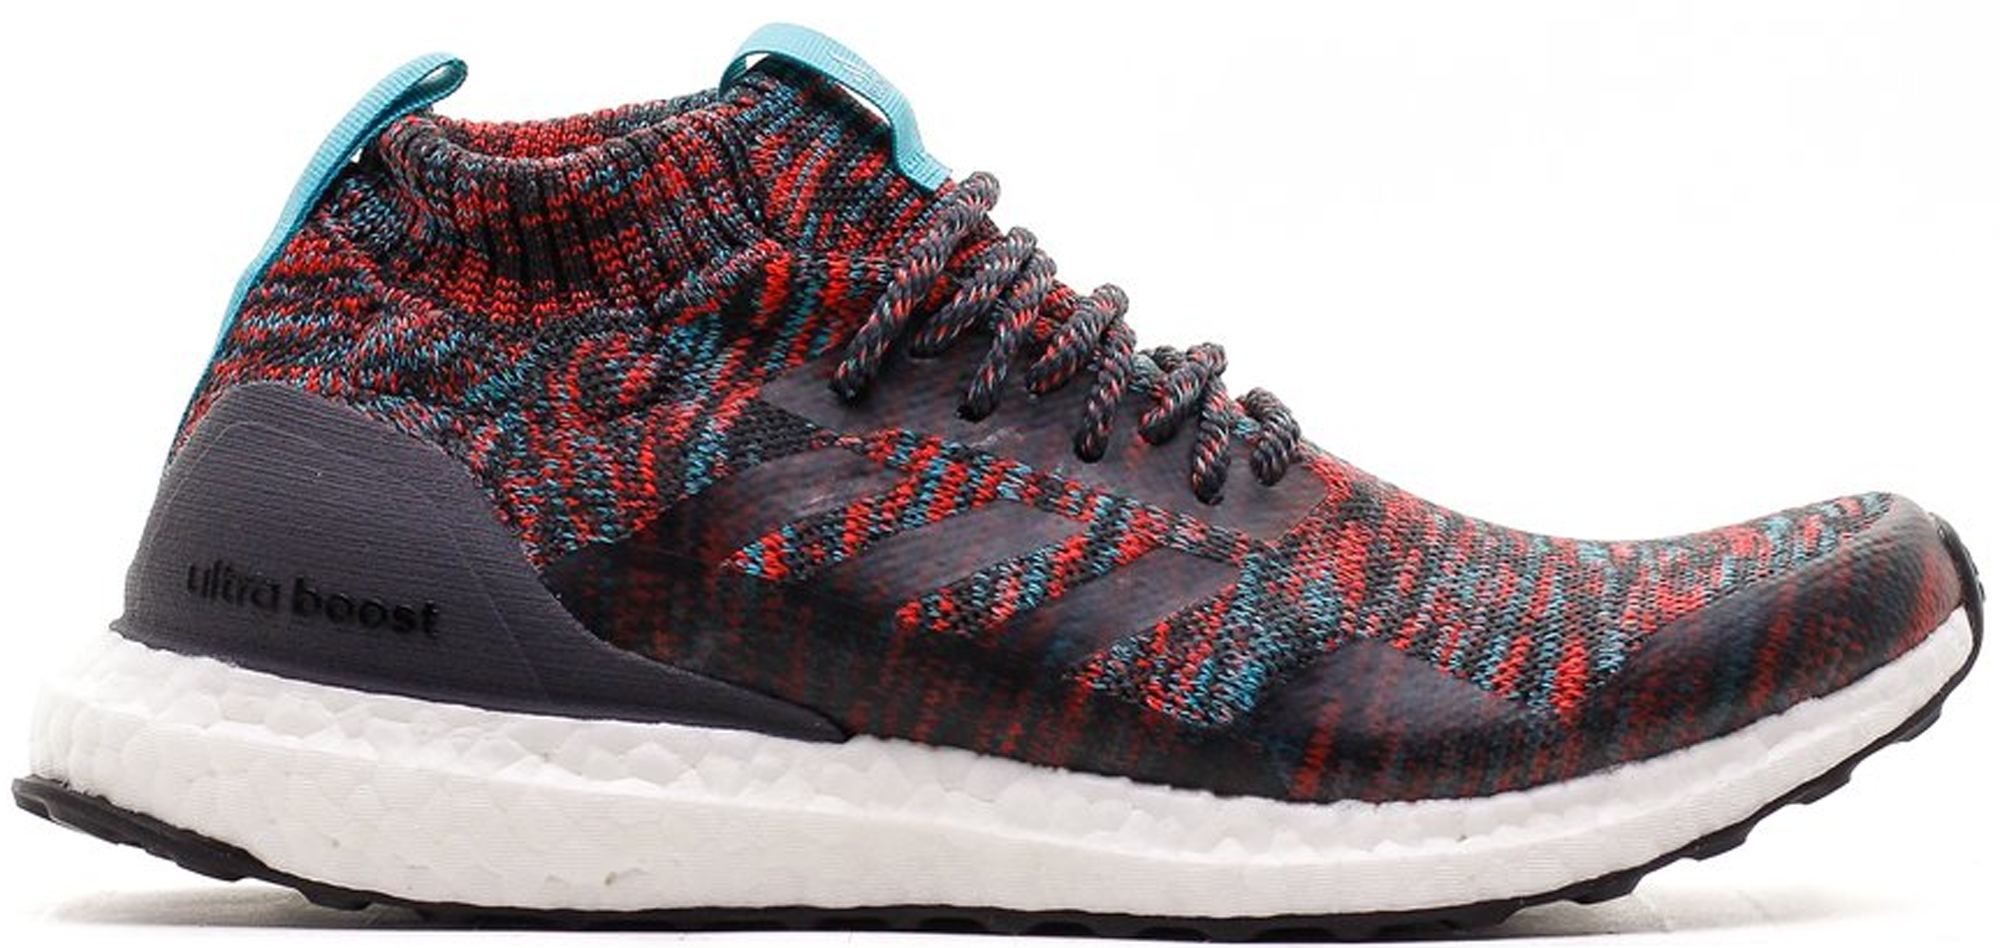 adidas Ultra Boost 3.0 Multicolor Release Date Sneaker Bar